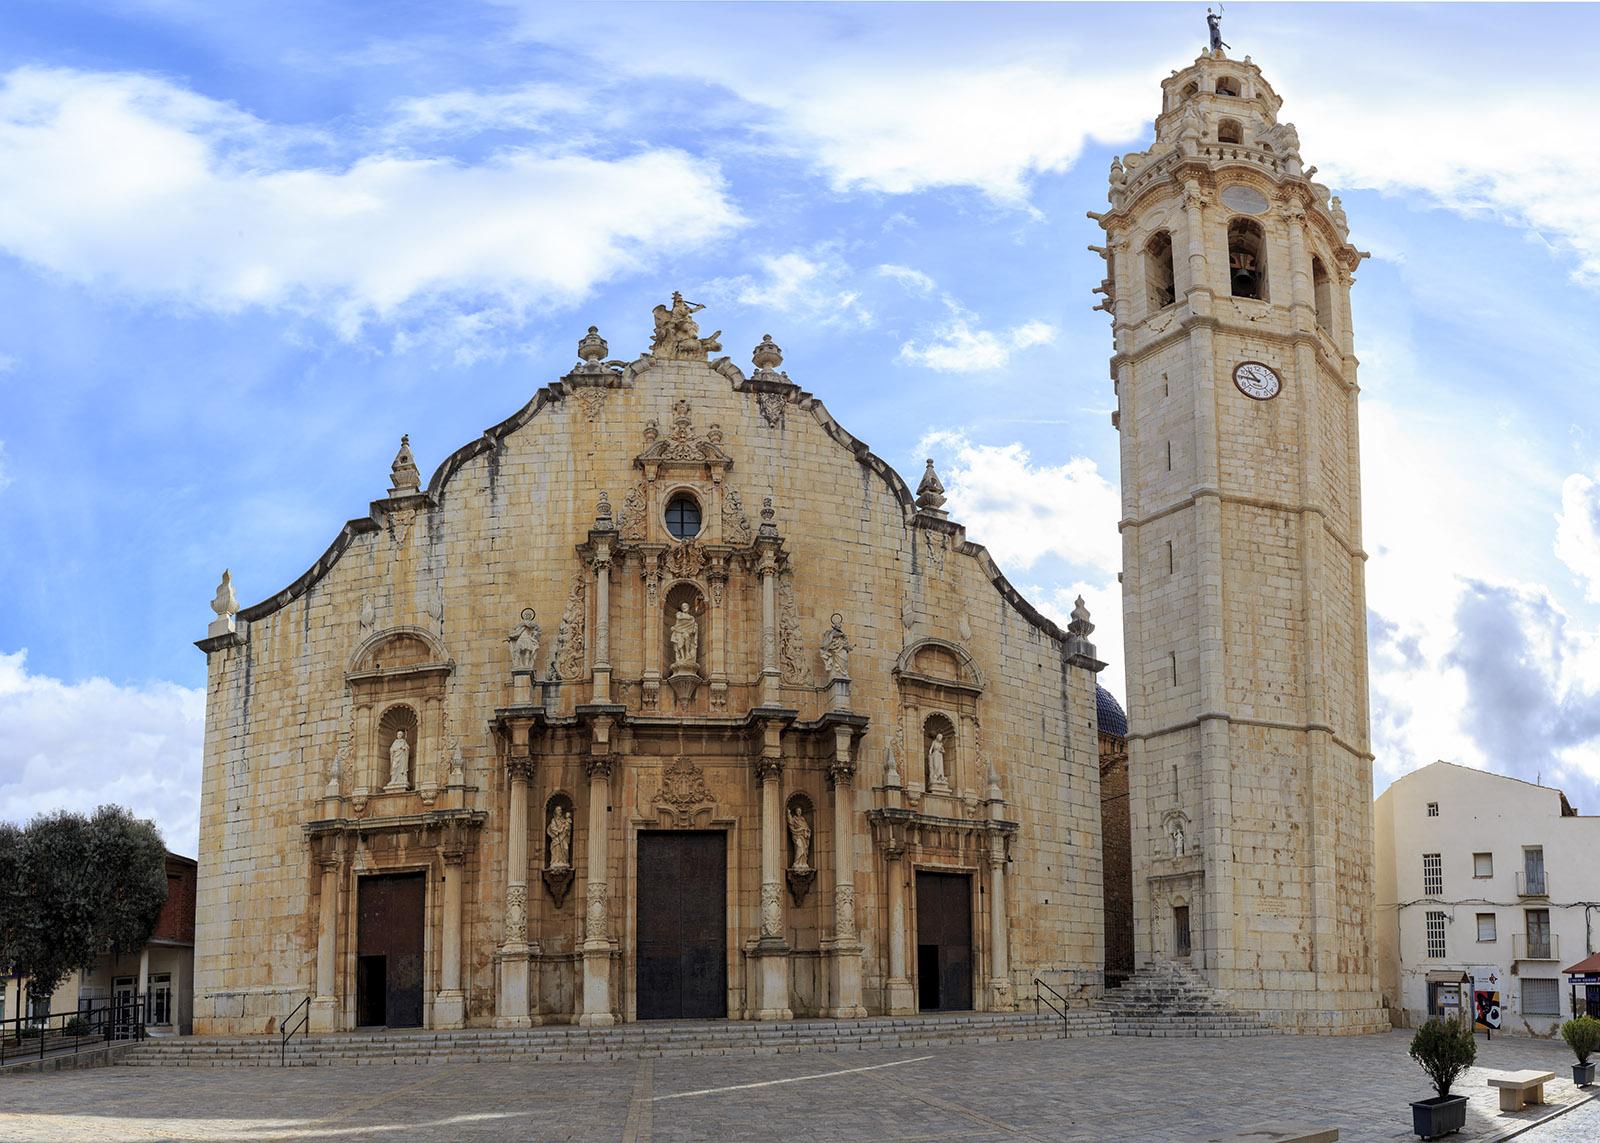 Resultado de imagen de Iglesia de San Juan Bautista alcala de xiverft